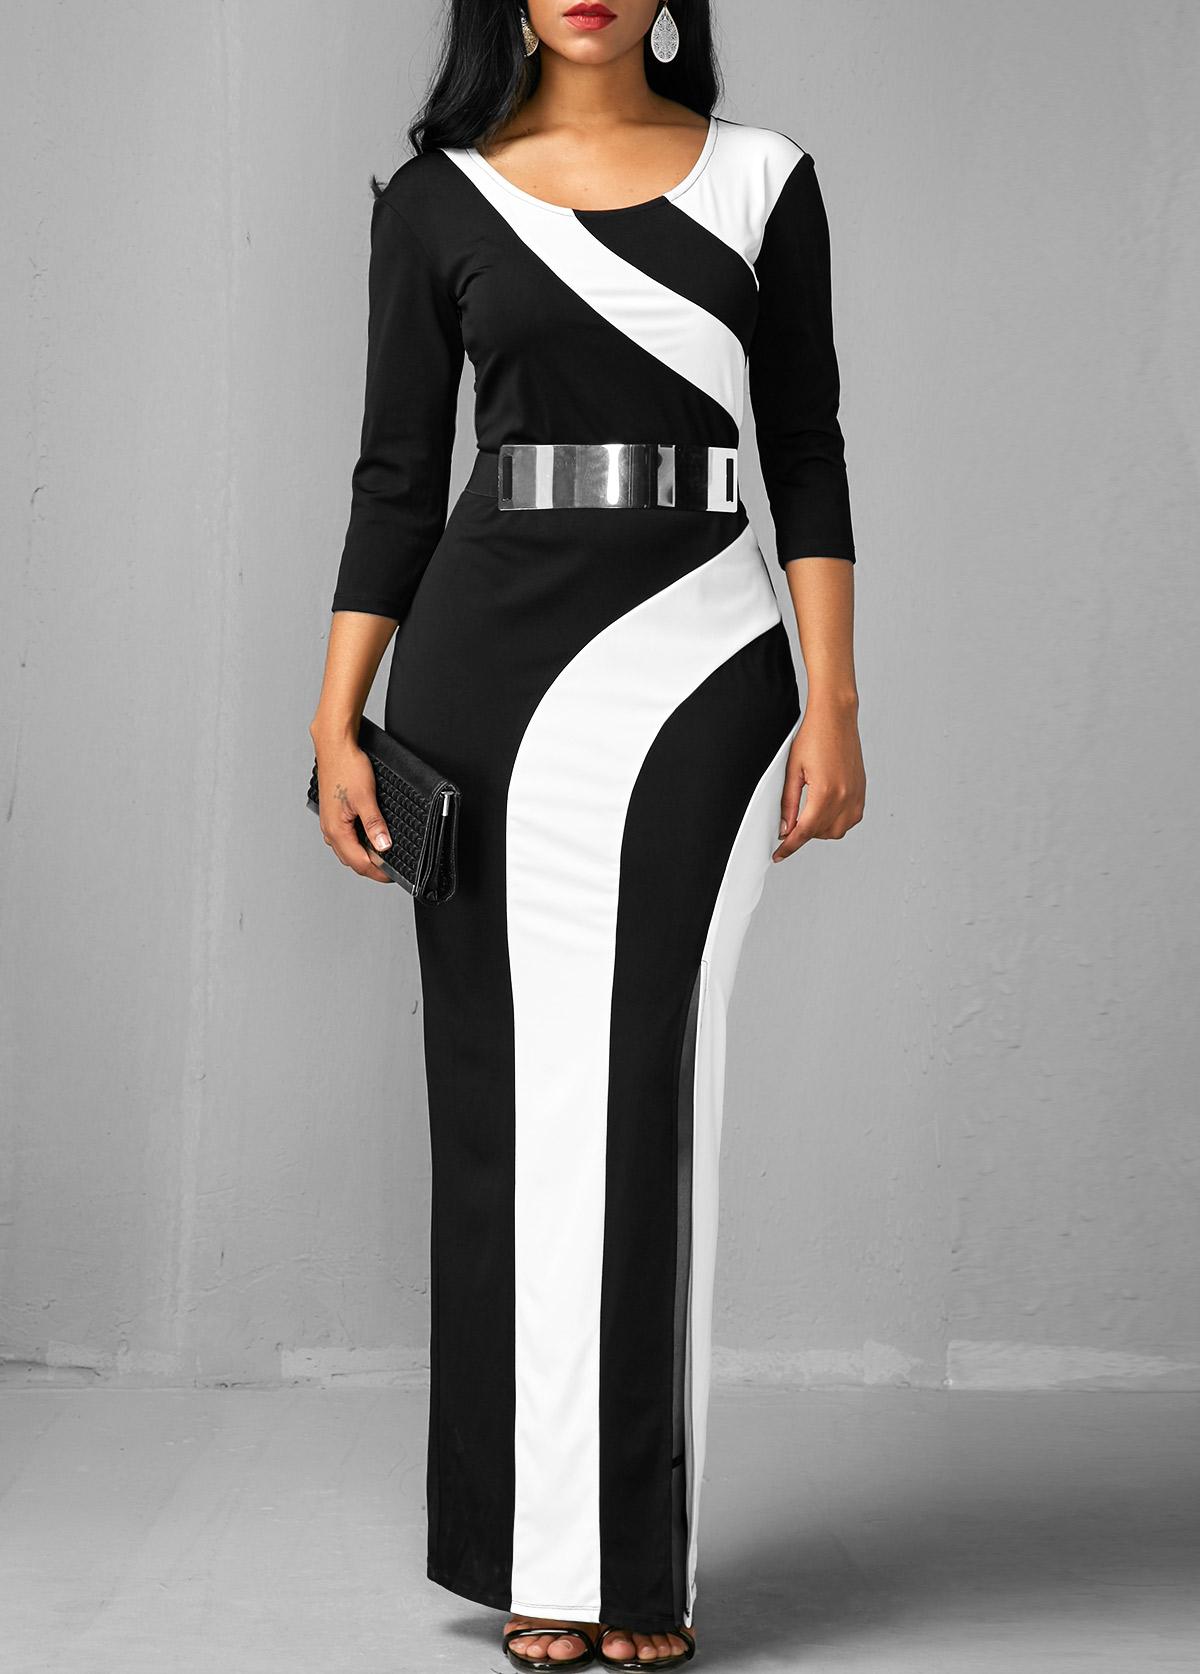 History vavavoom Glove Sleeve Skew Neck Black Dress tunics pinterest